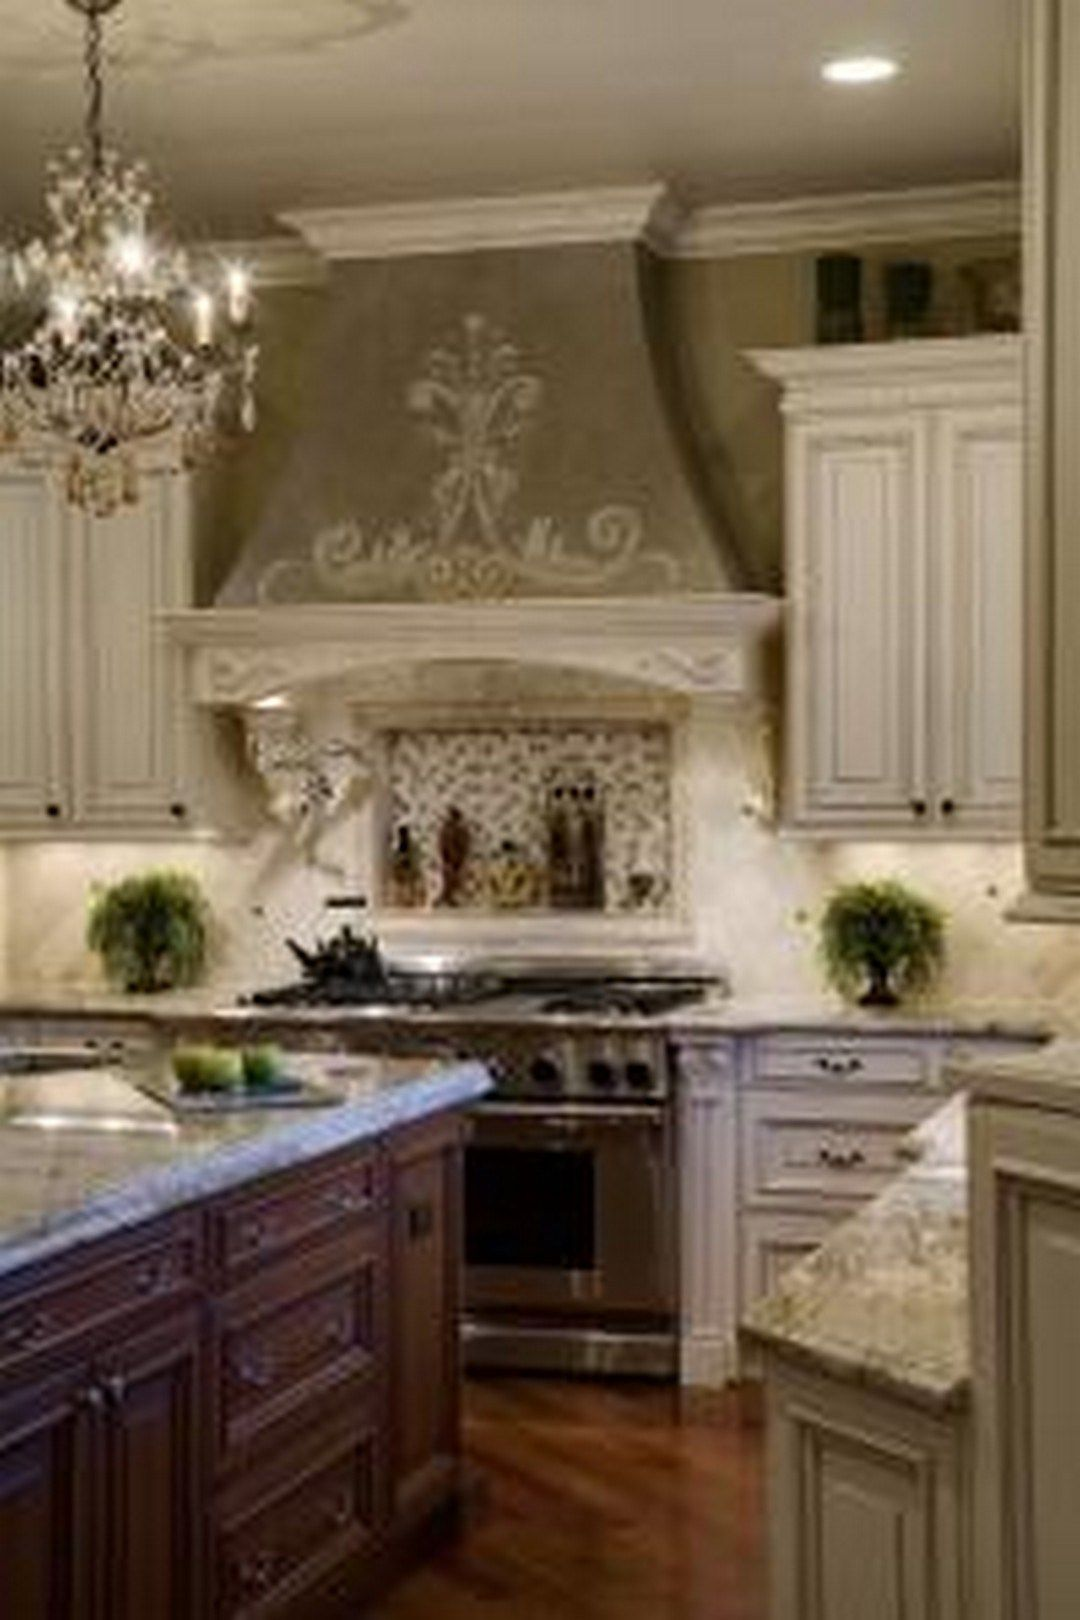 French Country Kitchen 99 French Country Kitchen Modern Design Ideas 38  House